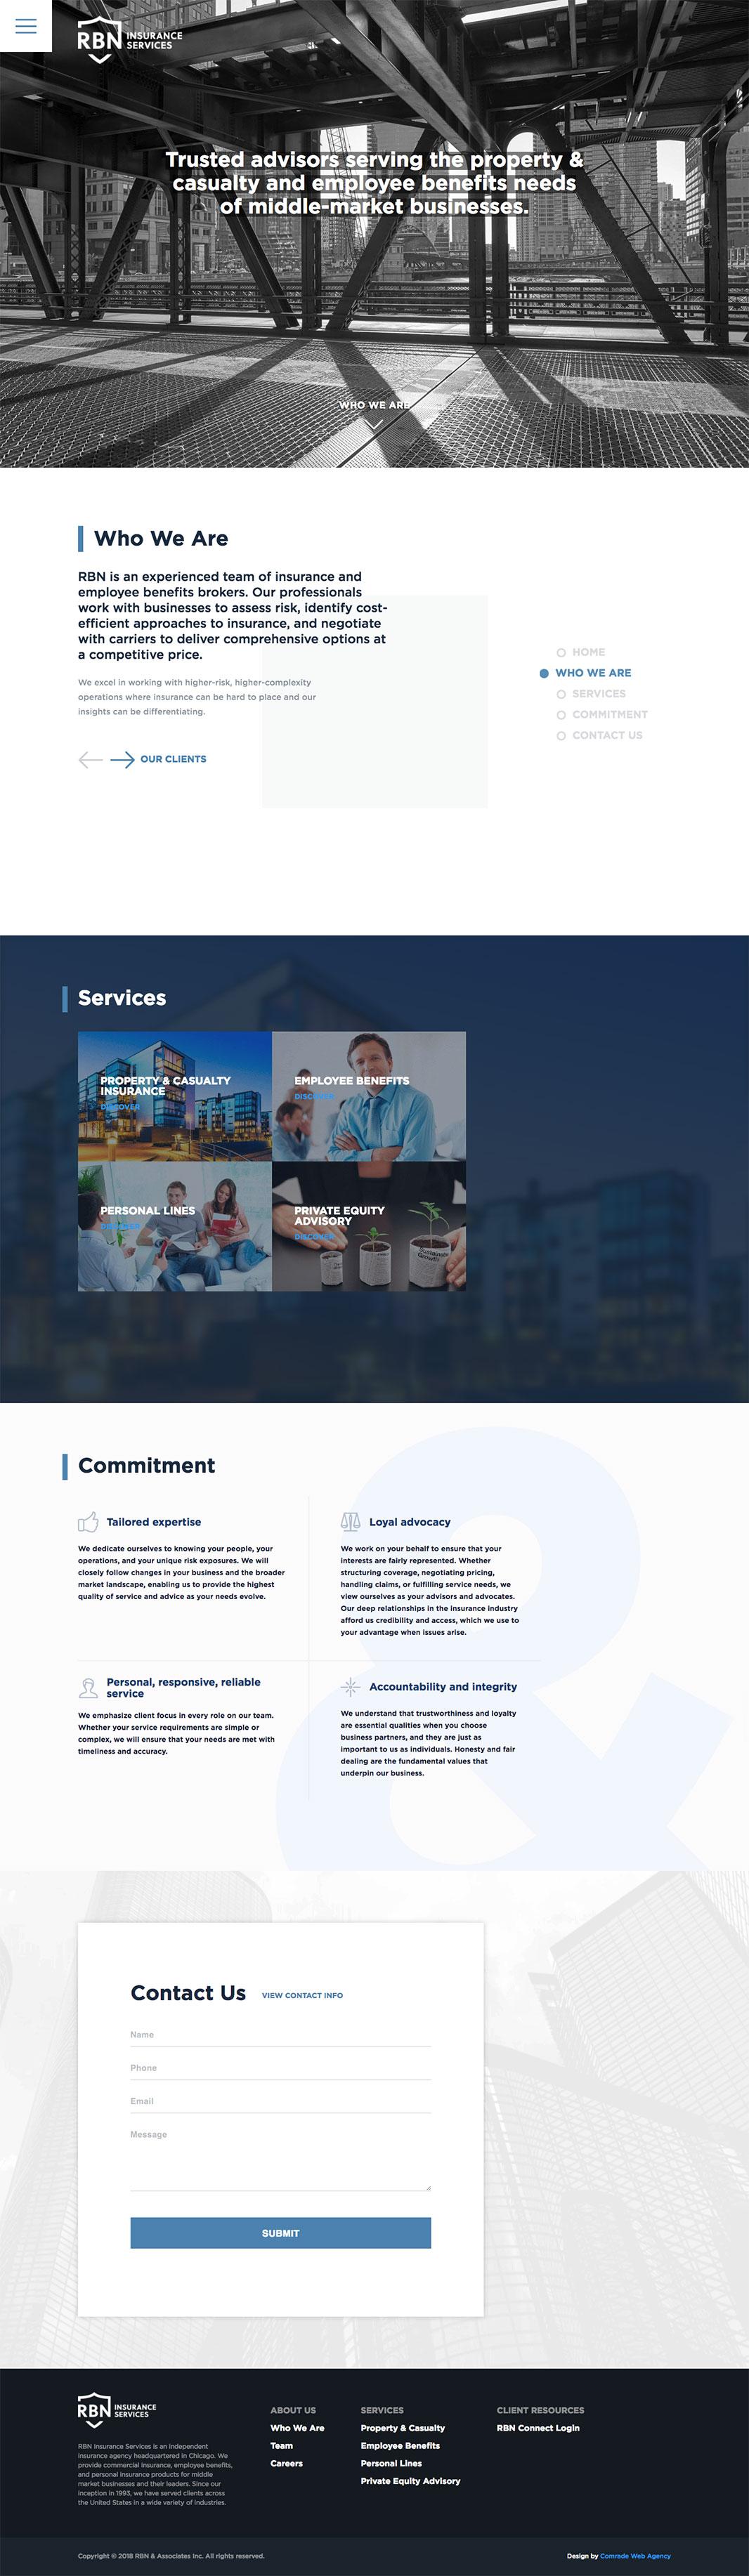 RBN Homepage